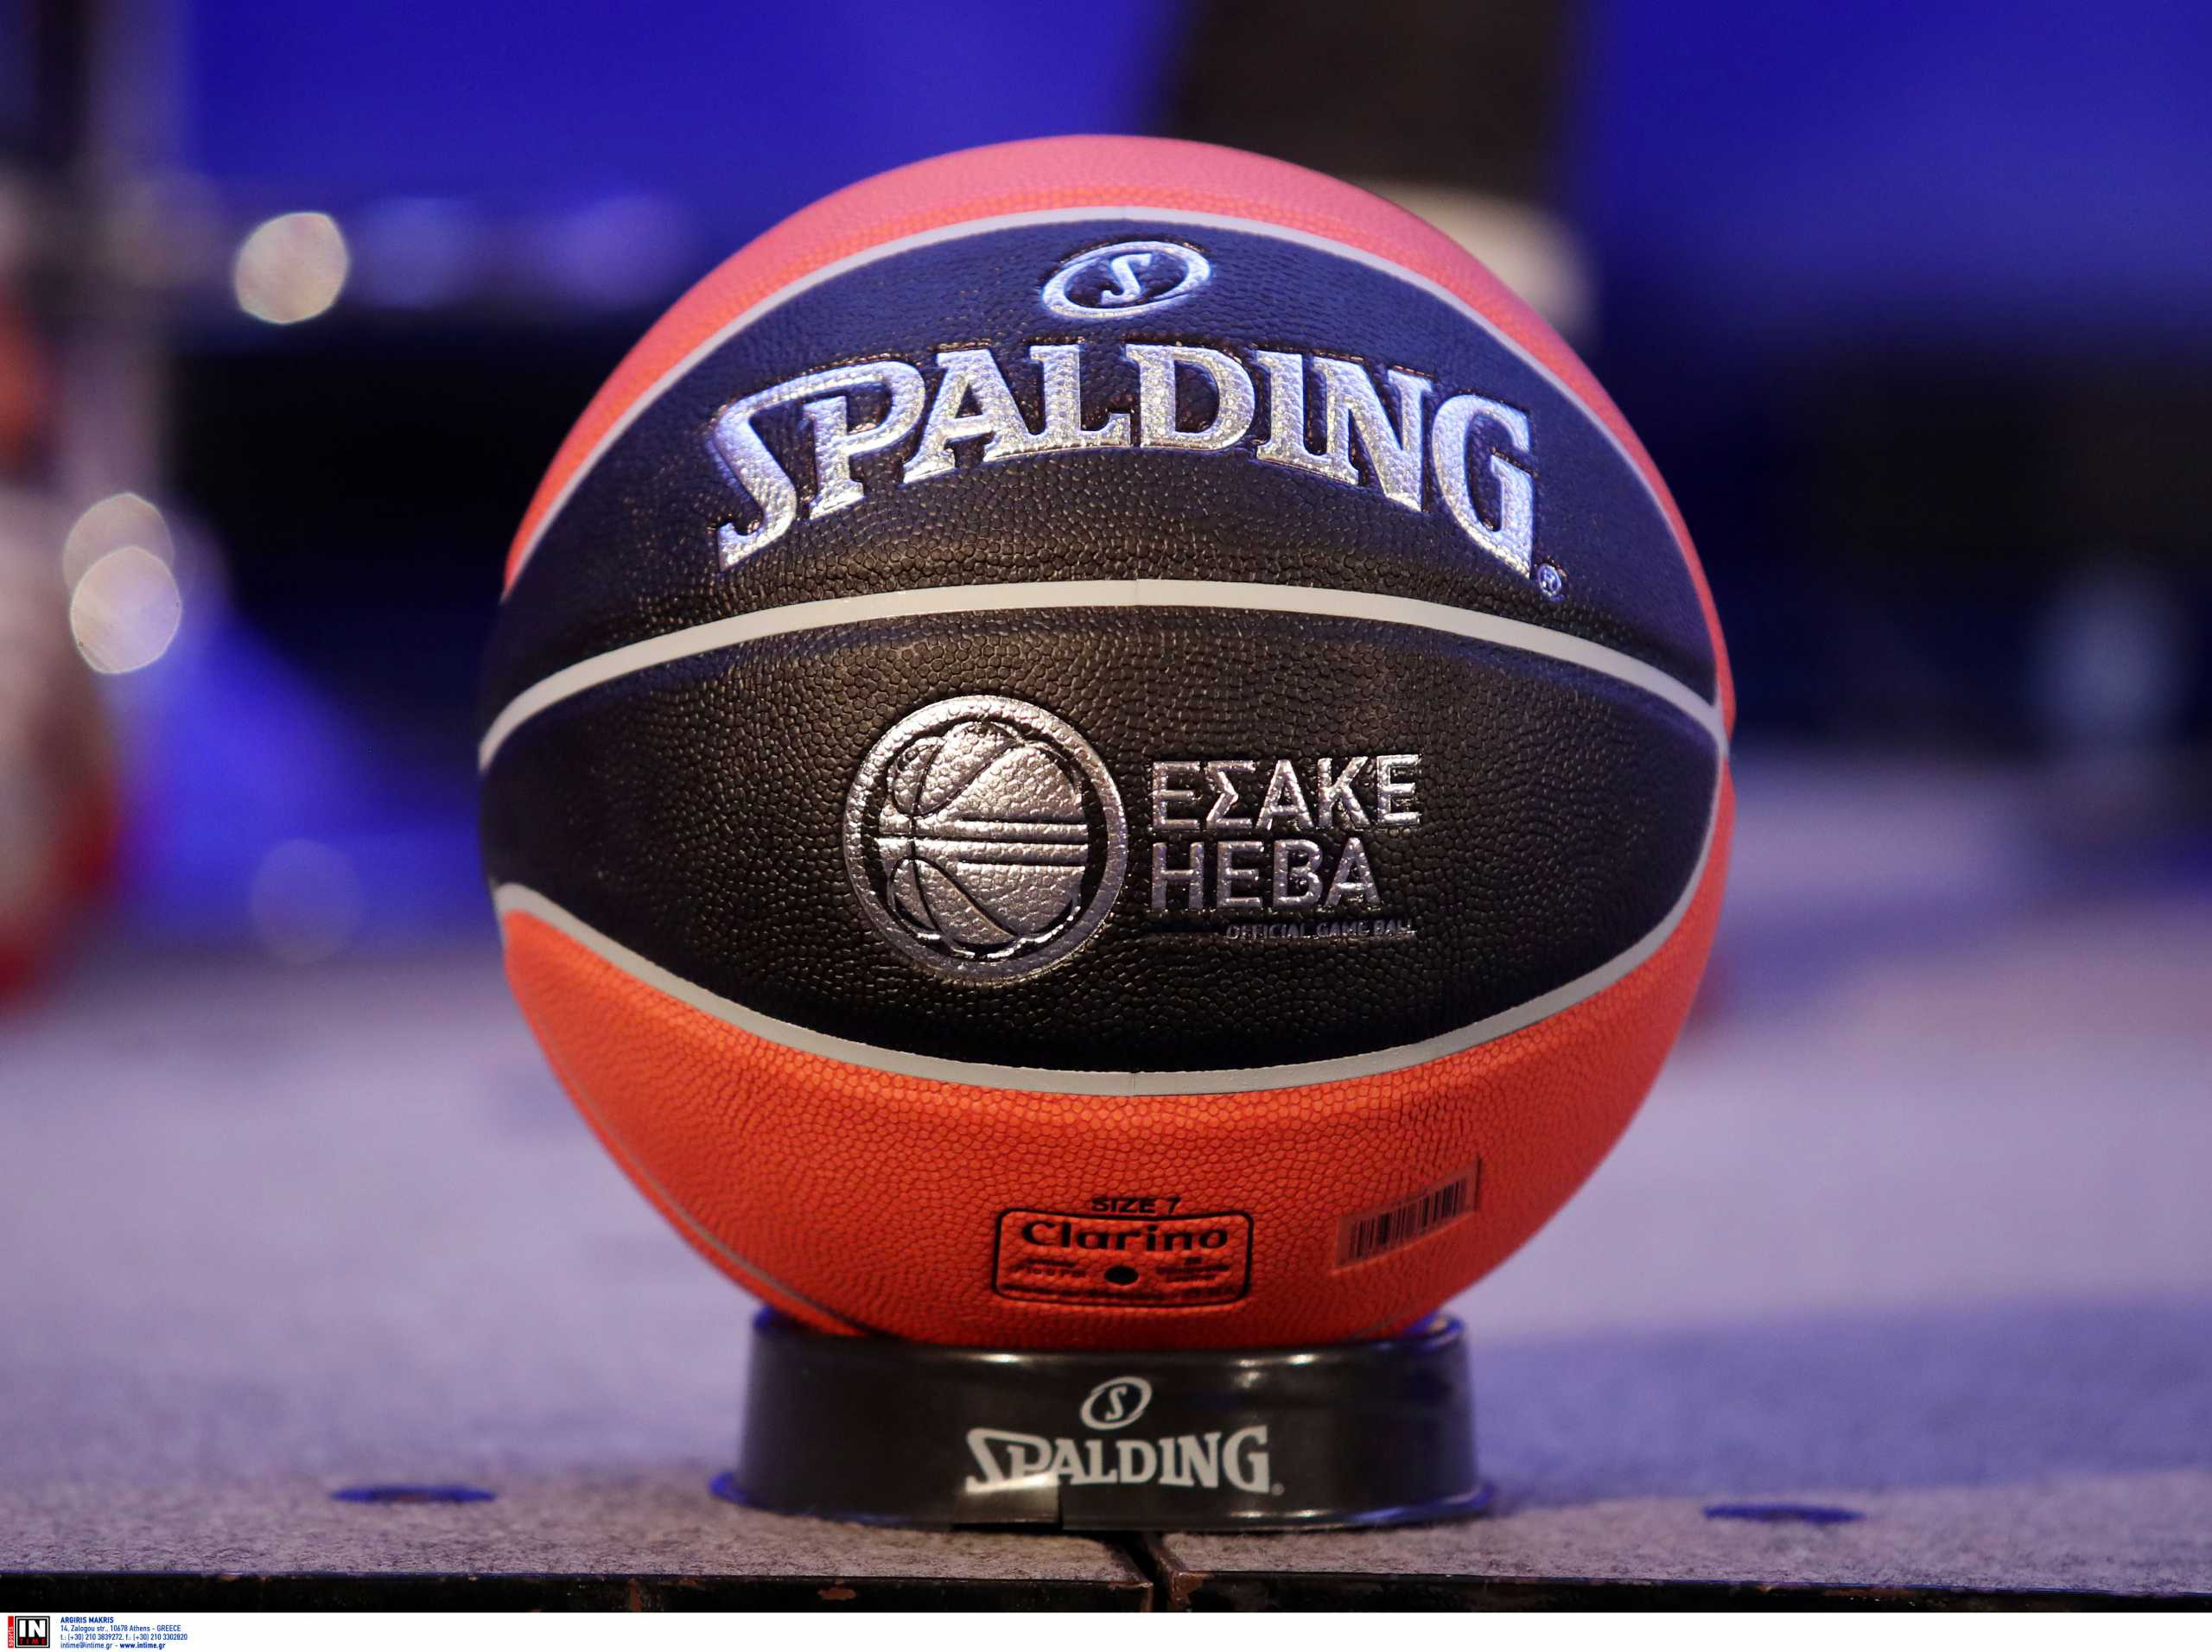 Basket League: Με αφαίρεση βαθμών θα ξεκινήσει ο Άρης, ο Απόλλων Πάτρας κι ο Κολοσσός Ρόδου